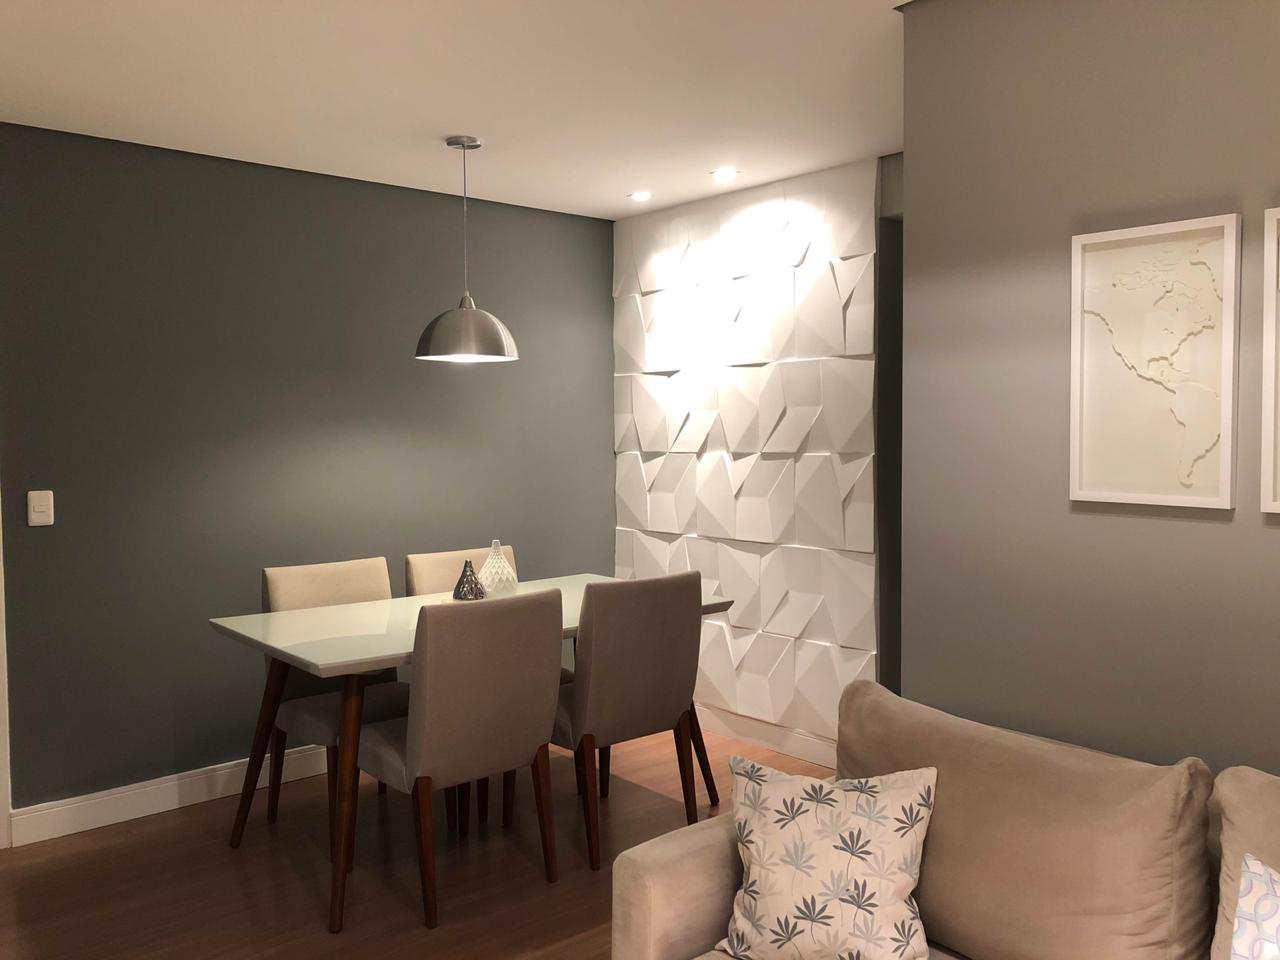 Apartamento com 2 dorms, Vila Iracema, Barueri - R$ 318 mil, Cod: 1104